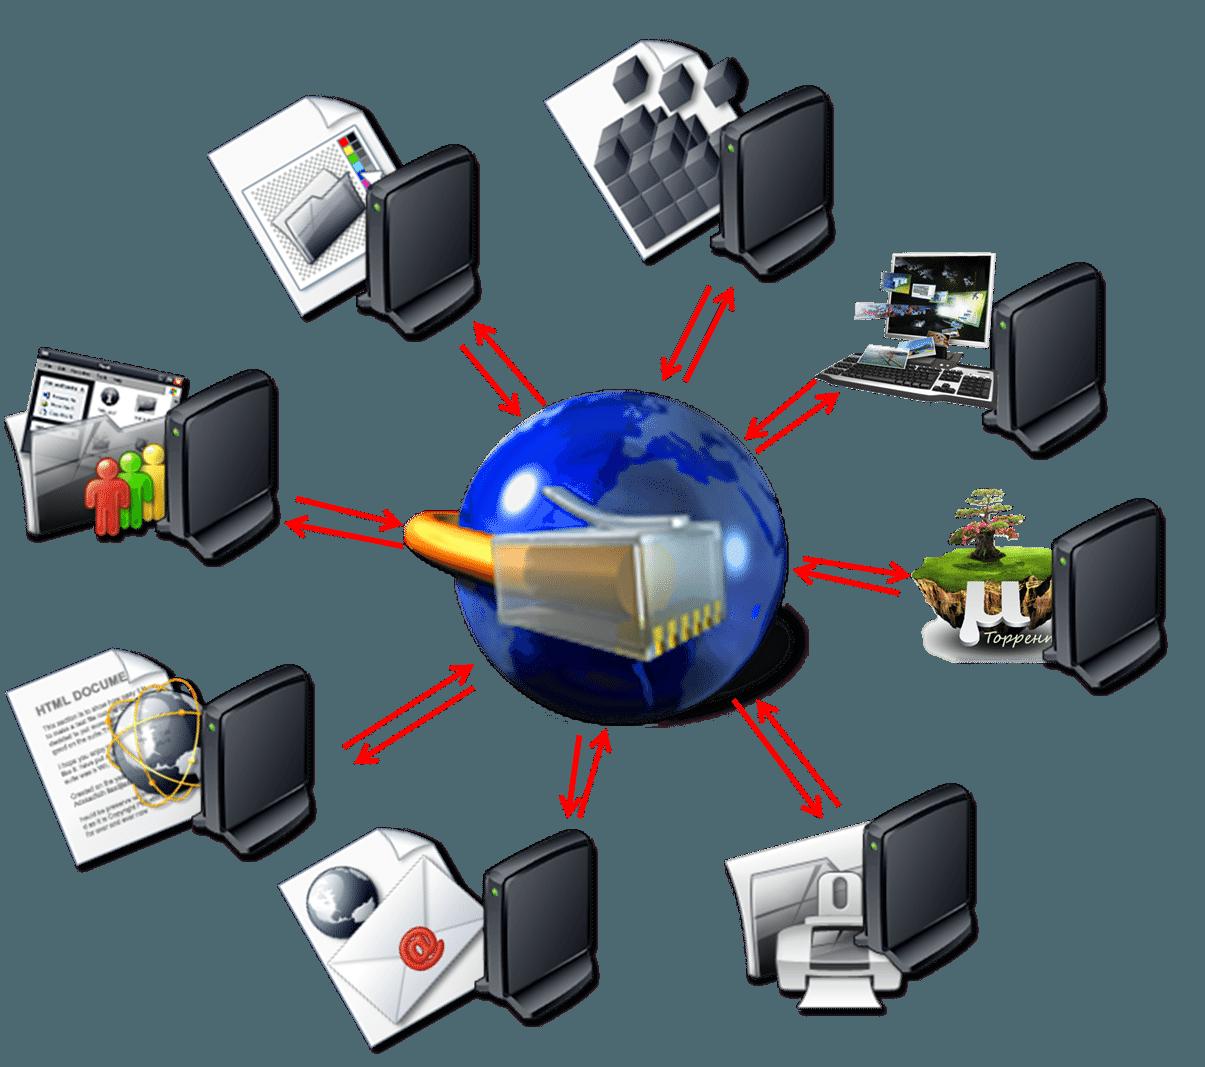 sistemasdistribuidos